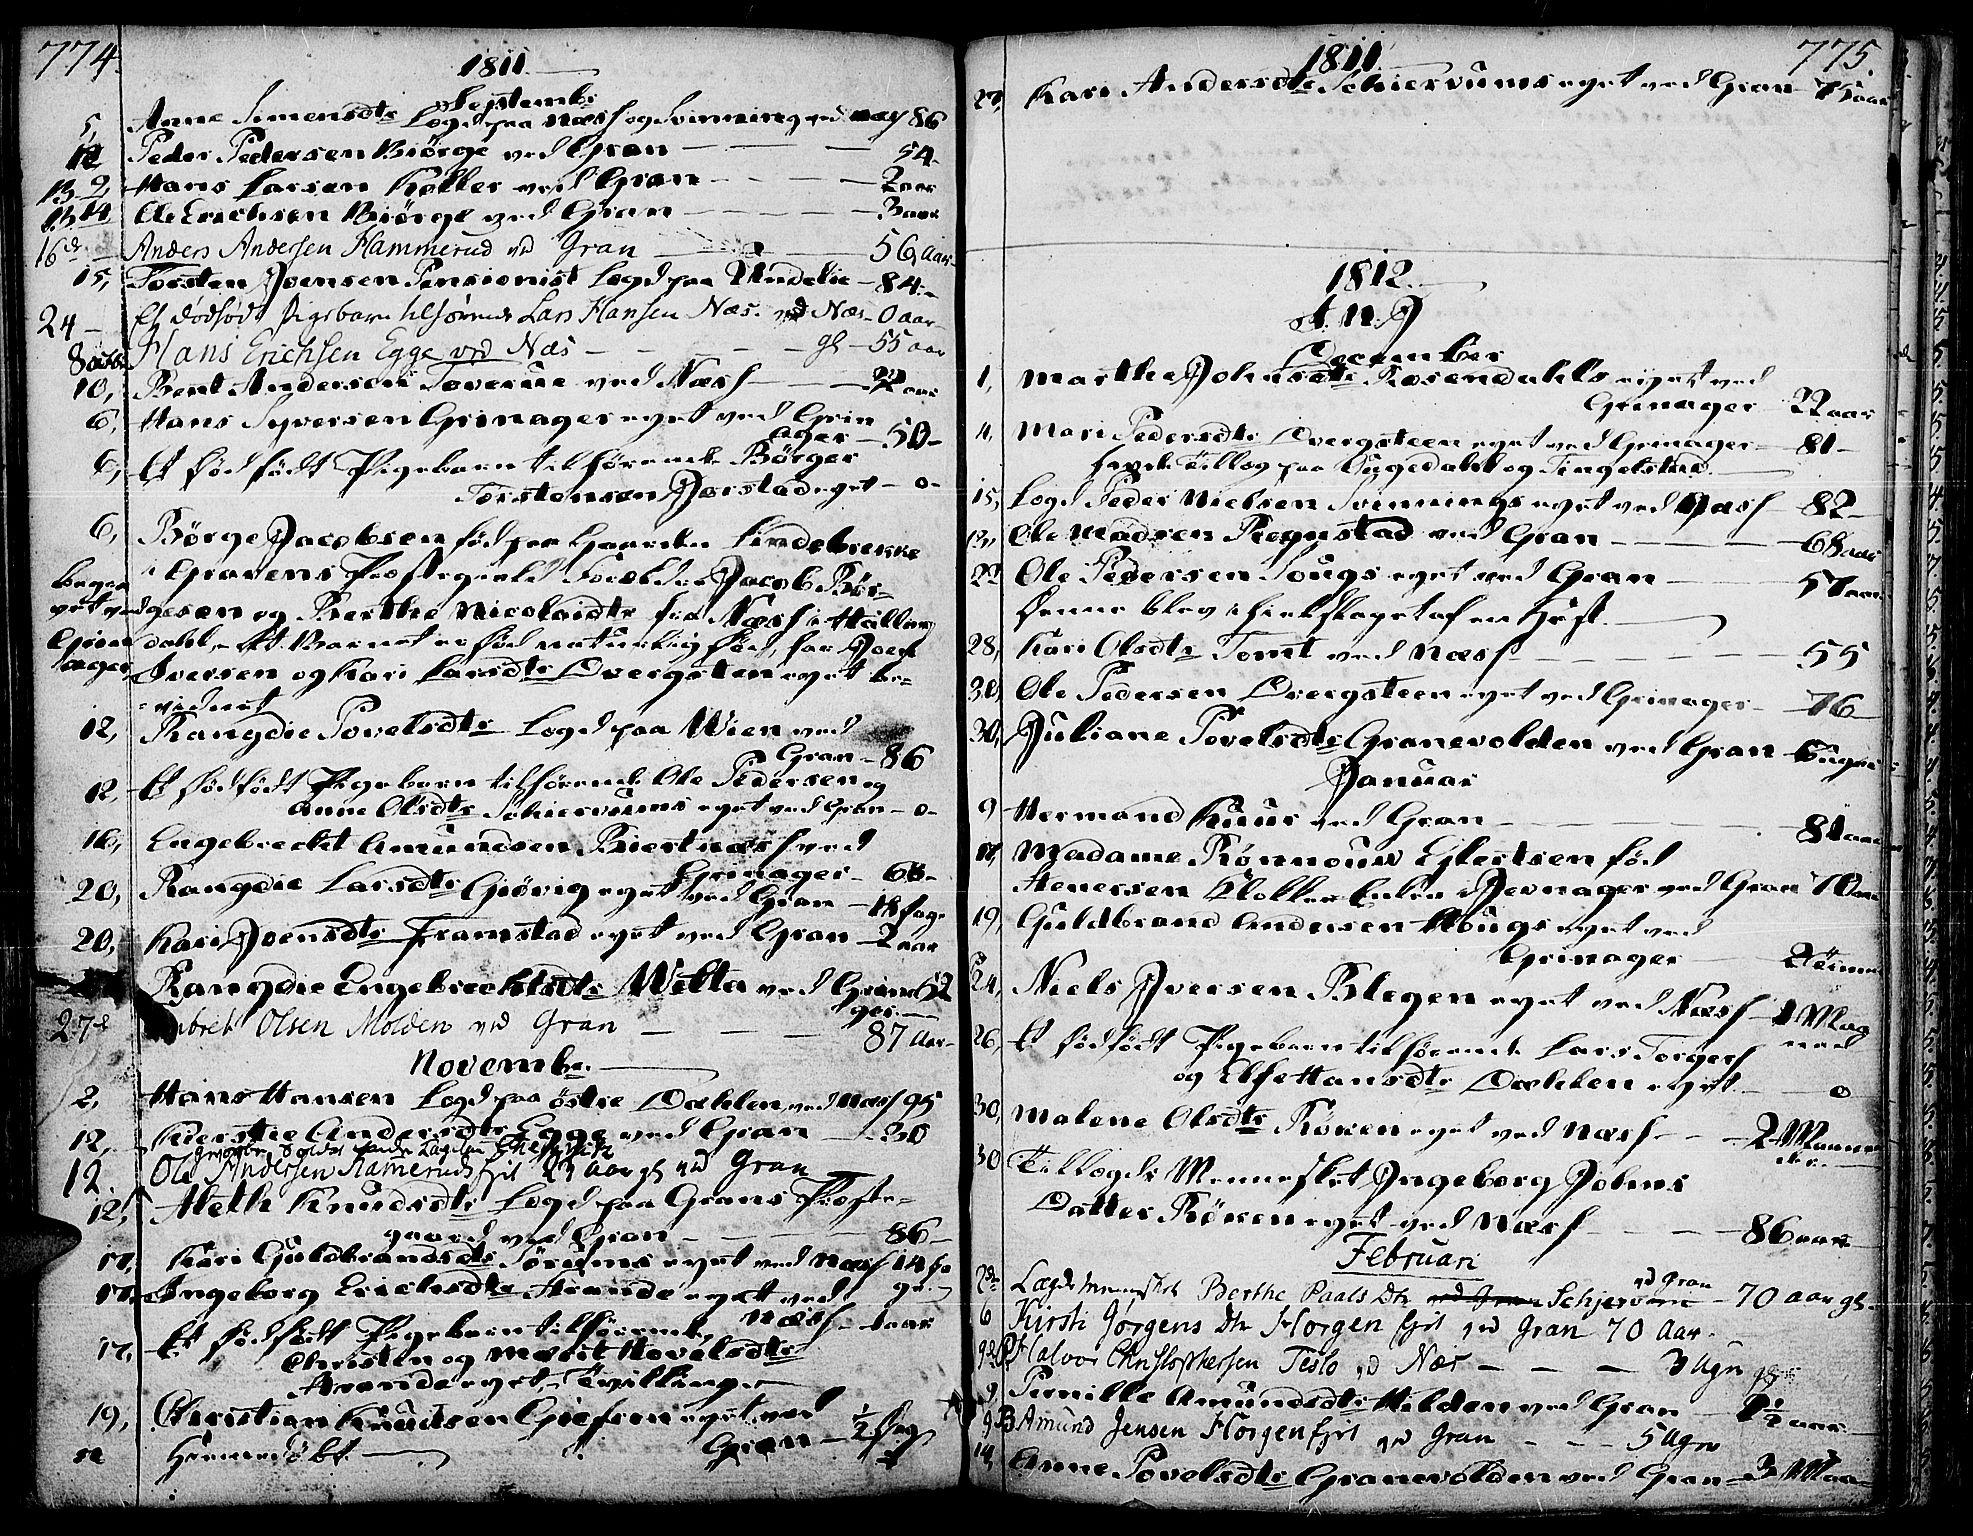 SAH, Gran prestekontor, Ministerialbok nr. 6, 1787-1824, s. 774-775